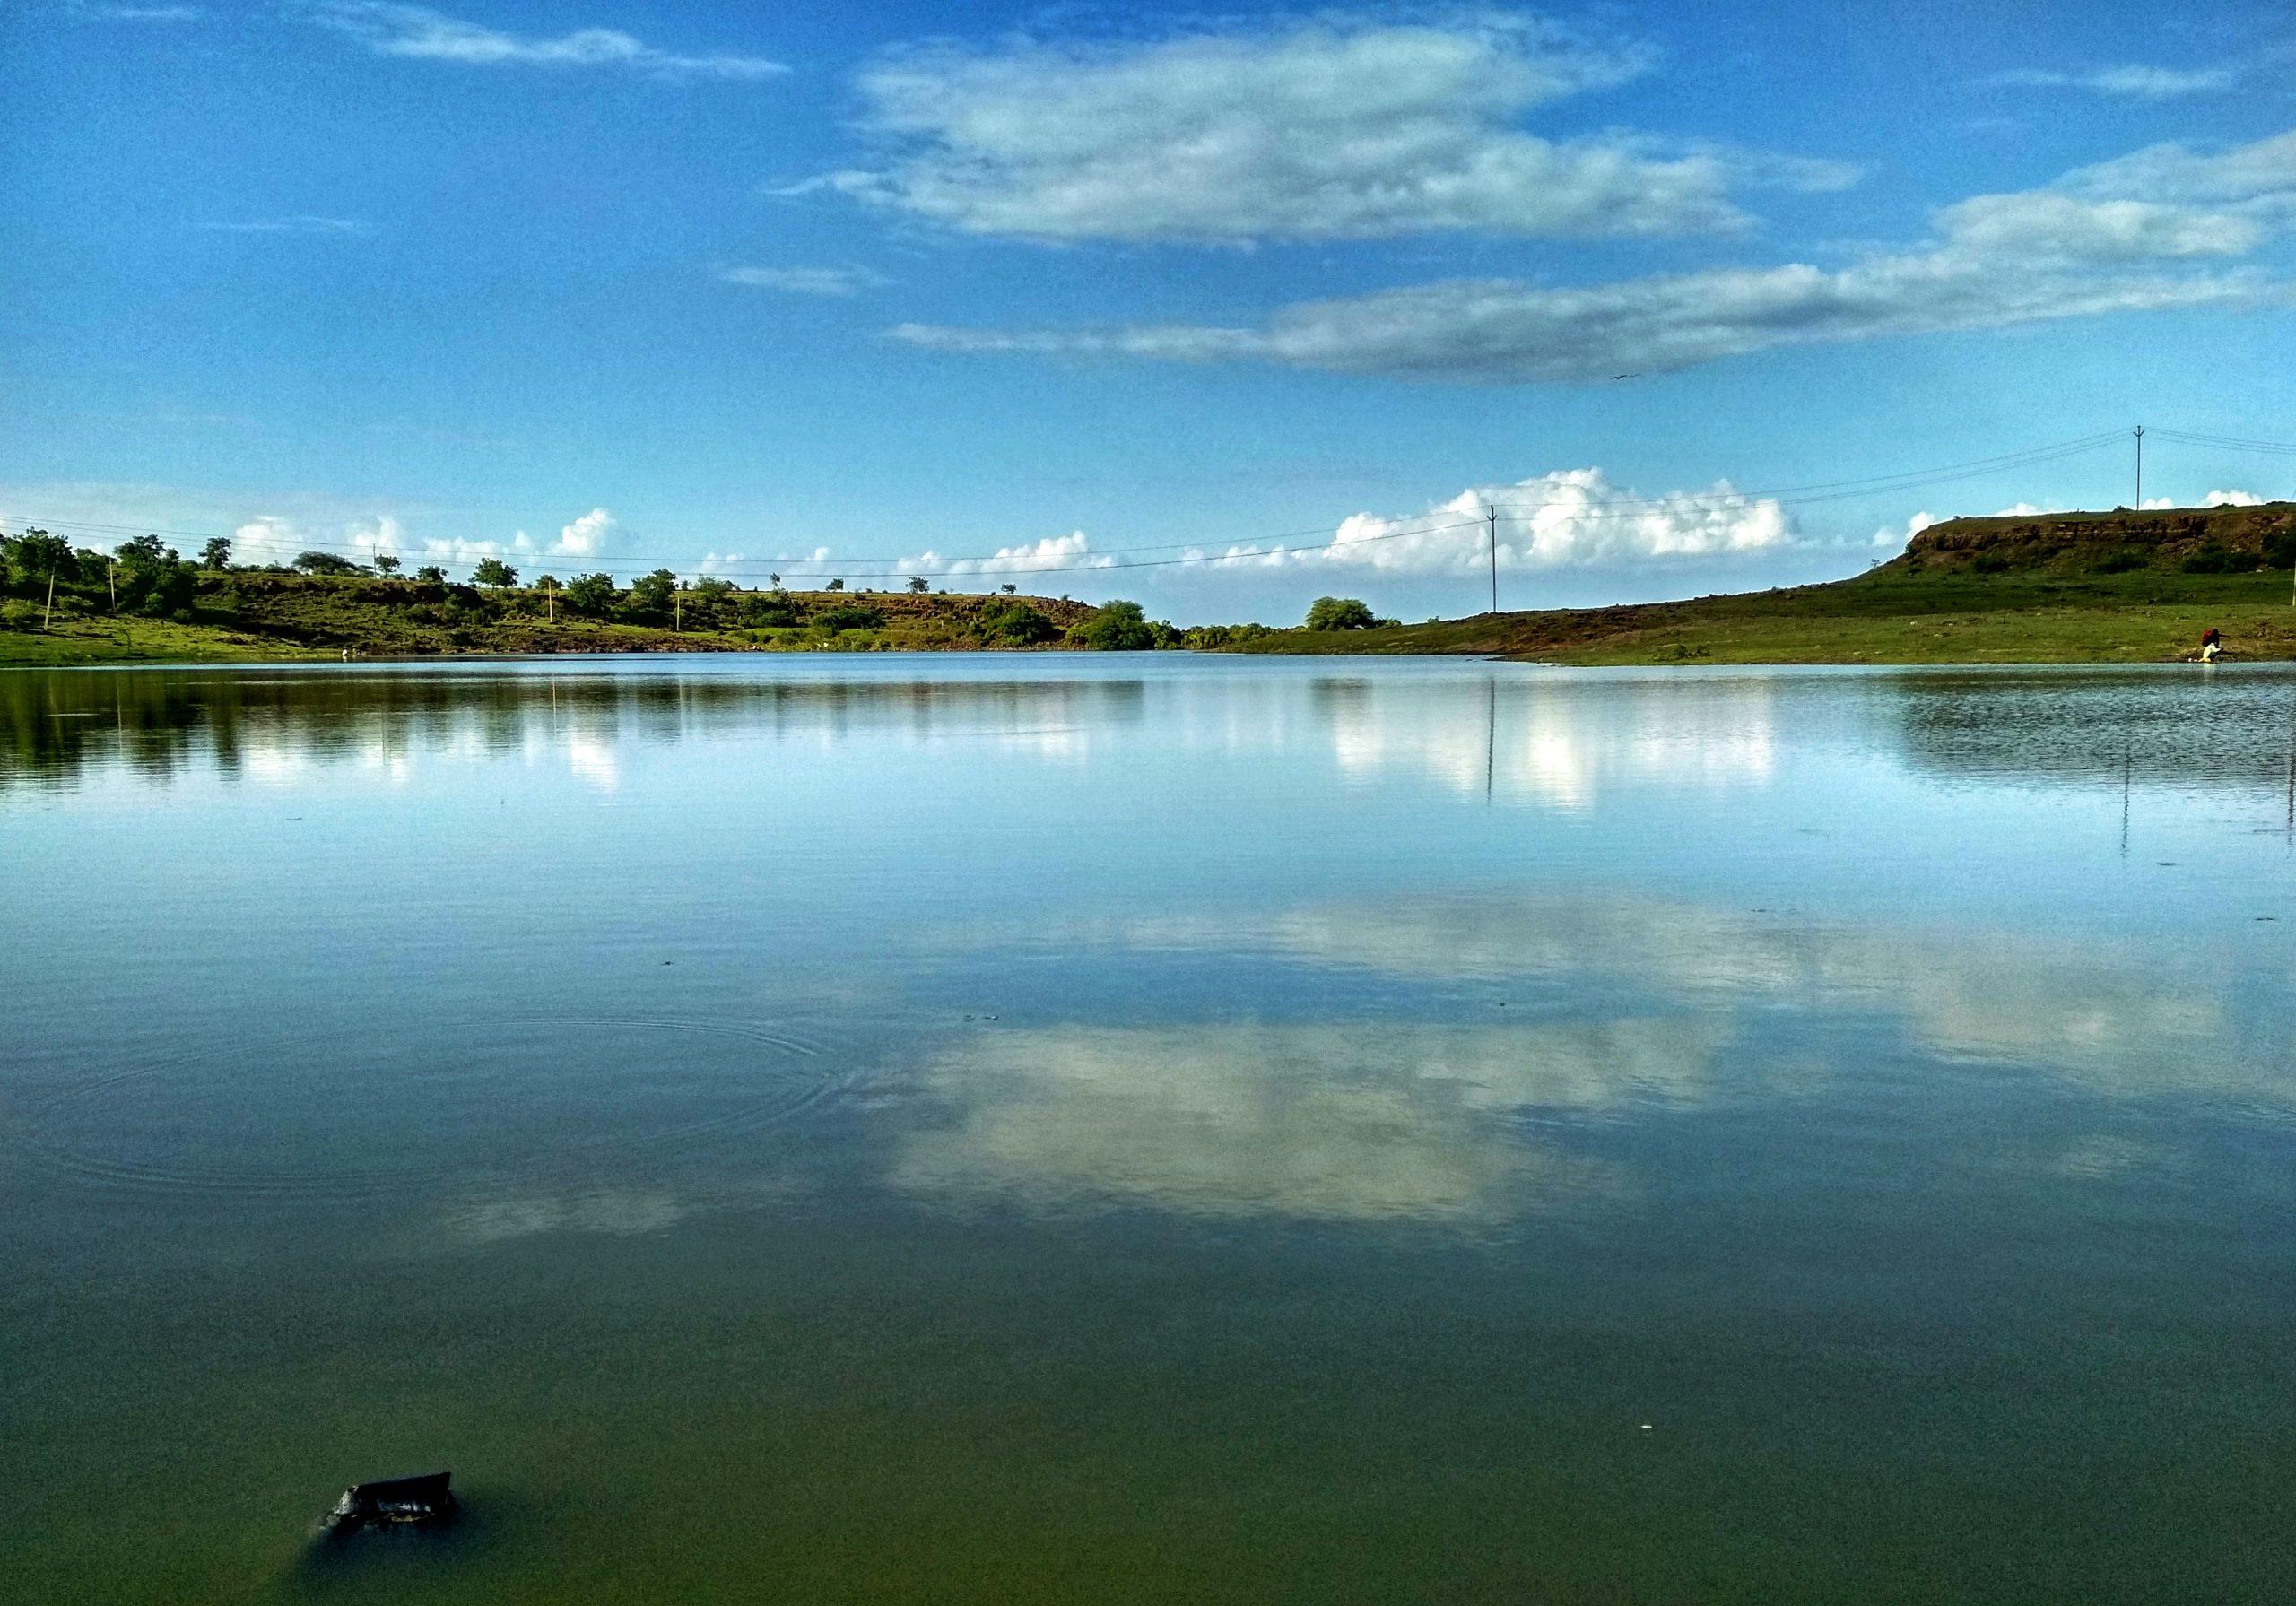 A lake water